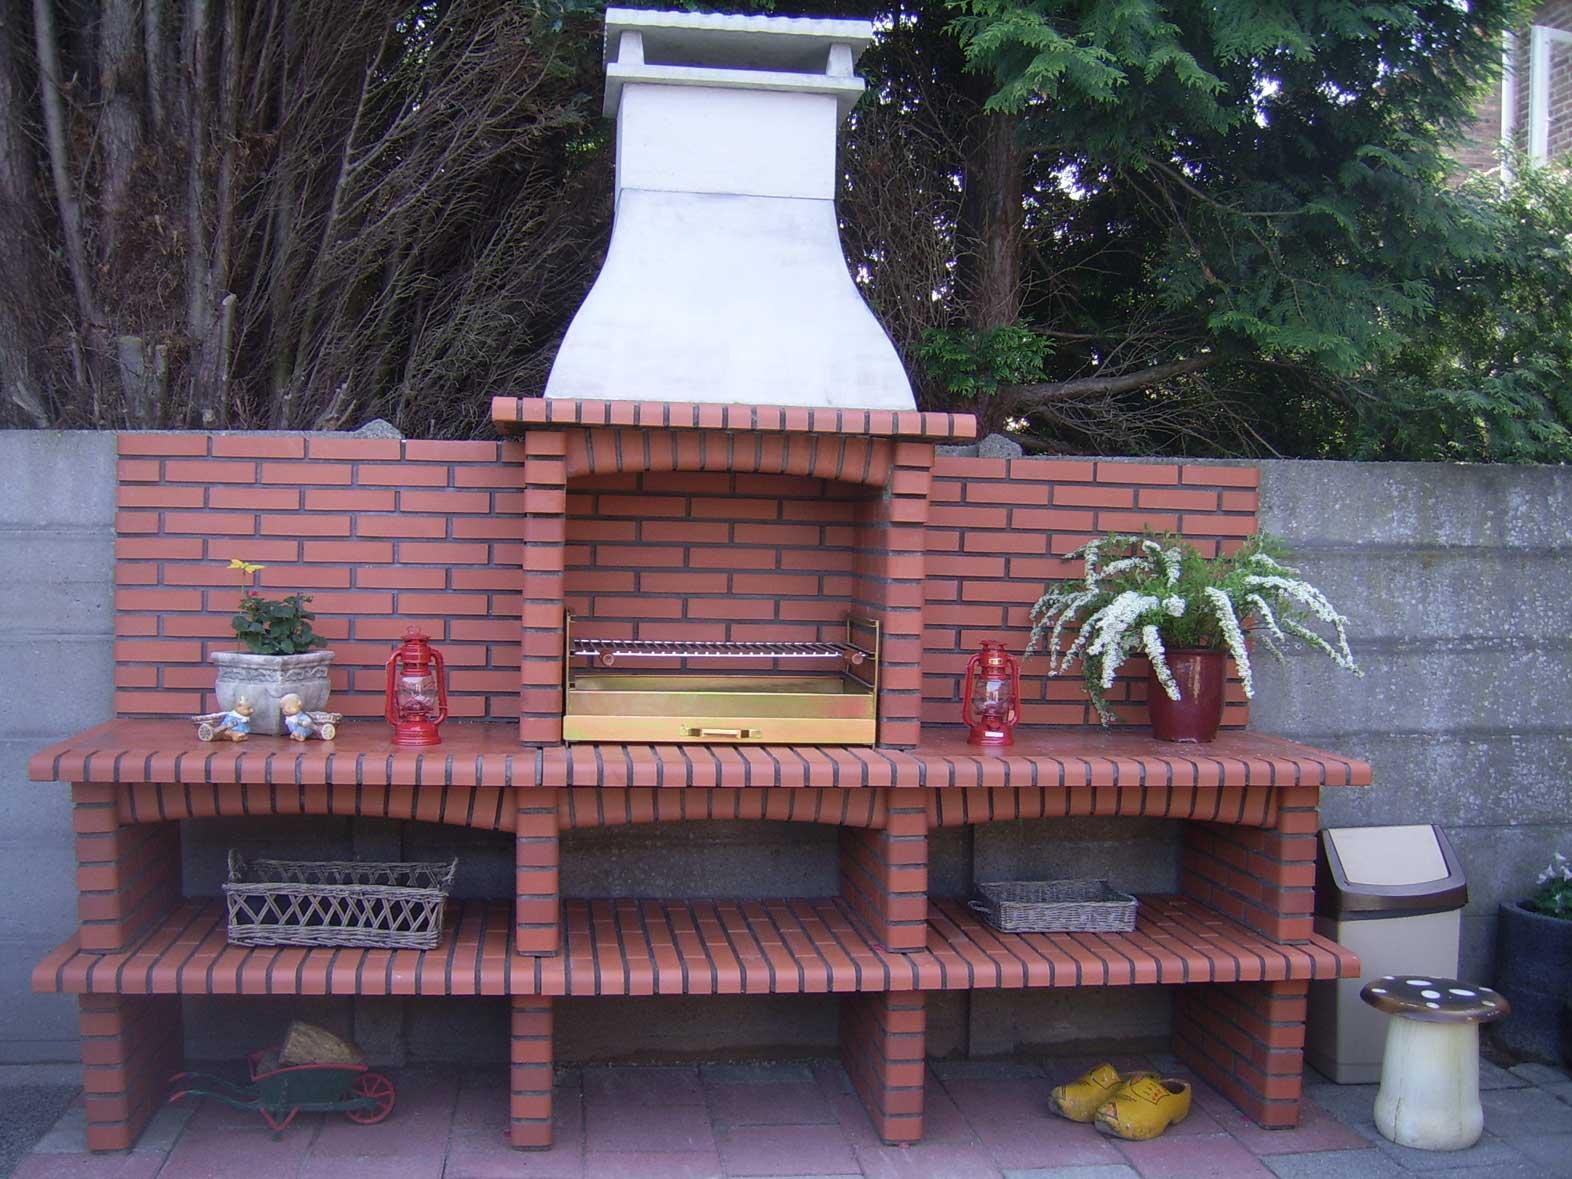 Aveiro 07/4 - steen kleur Rood en grillset G11/70